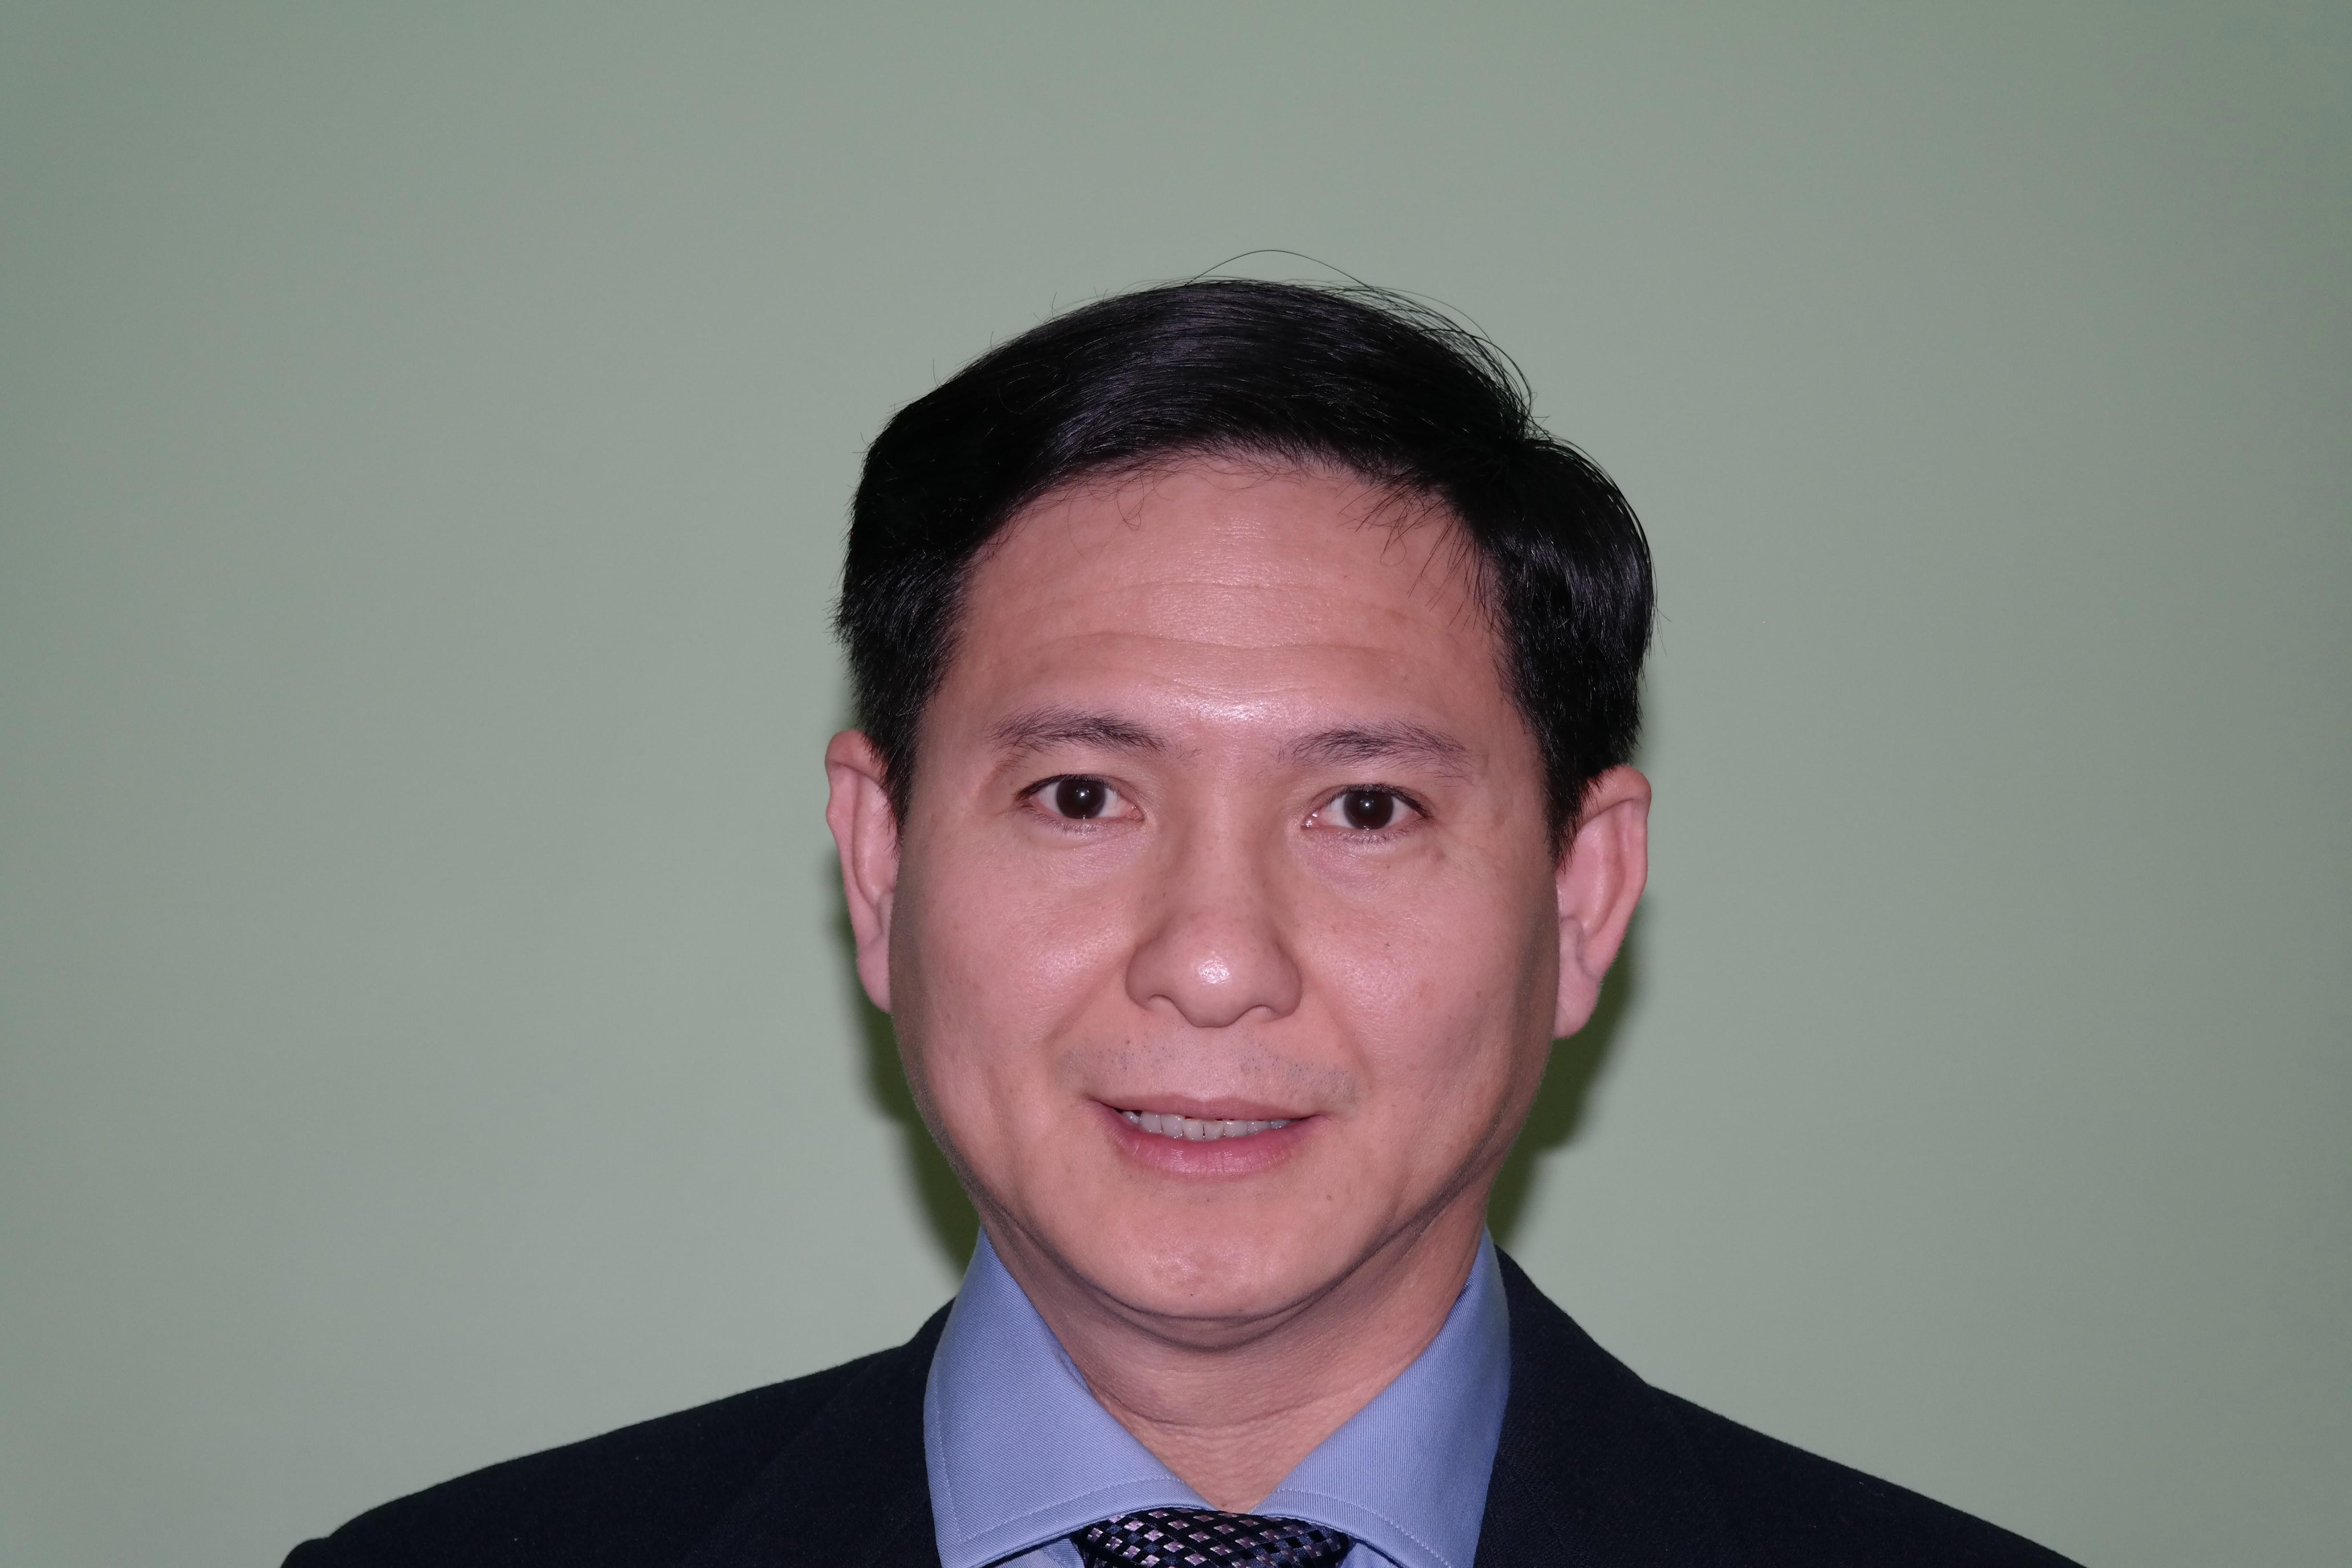 VIET DUYTHO TON Financial Professional & Insurance Agent